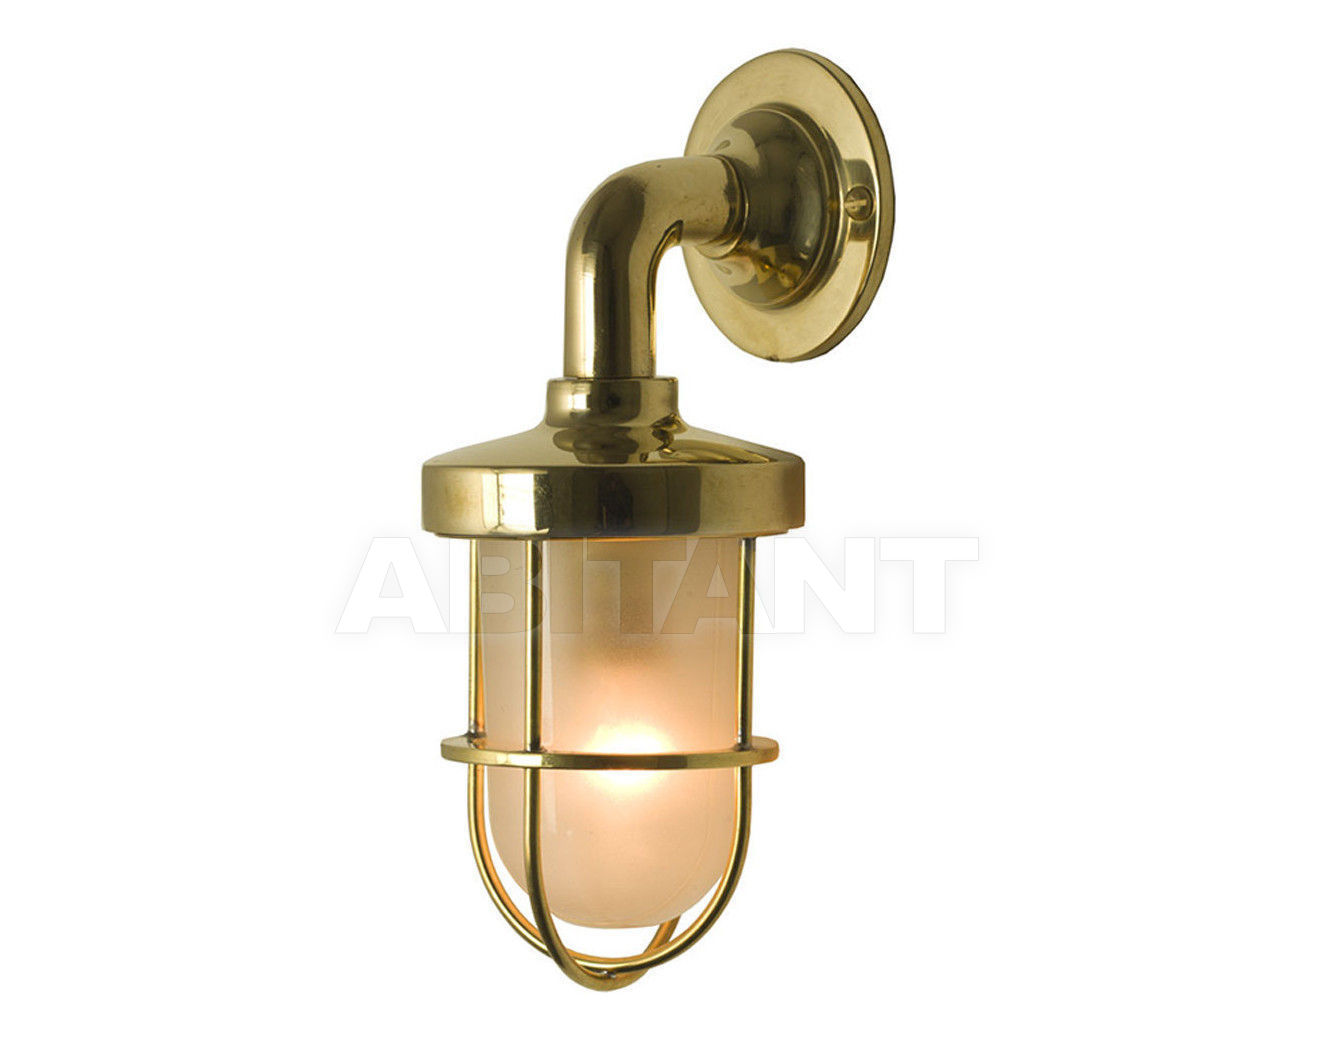 Купить Фонарь Davey Lighting Wall Mounted Lights 7207/BR/M/FR